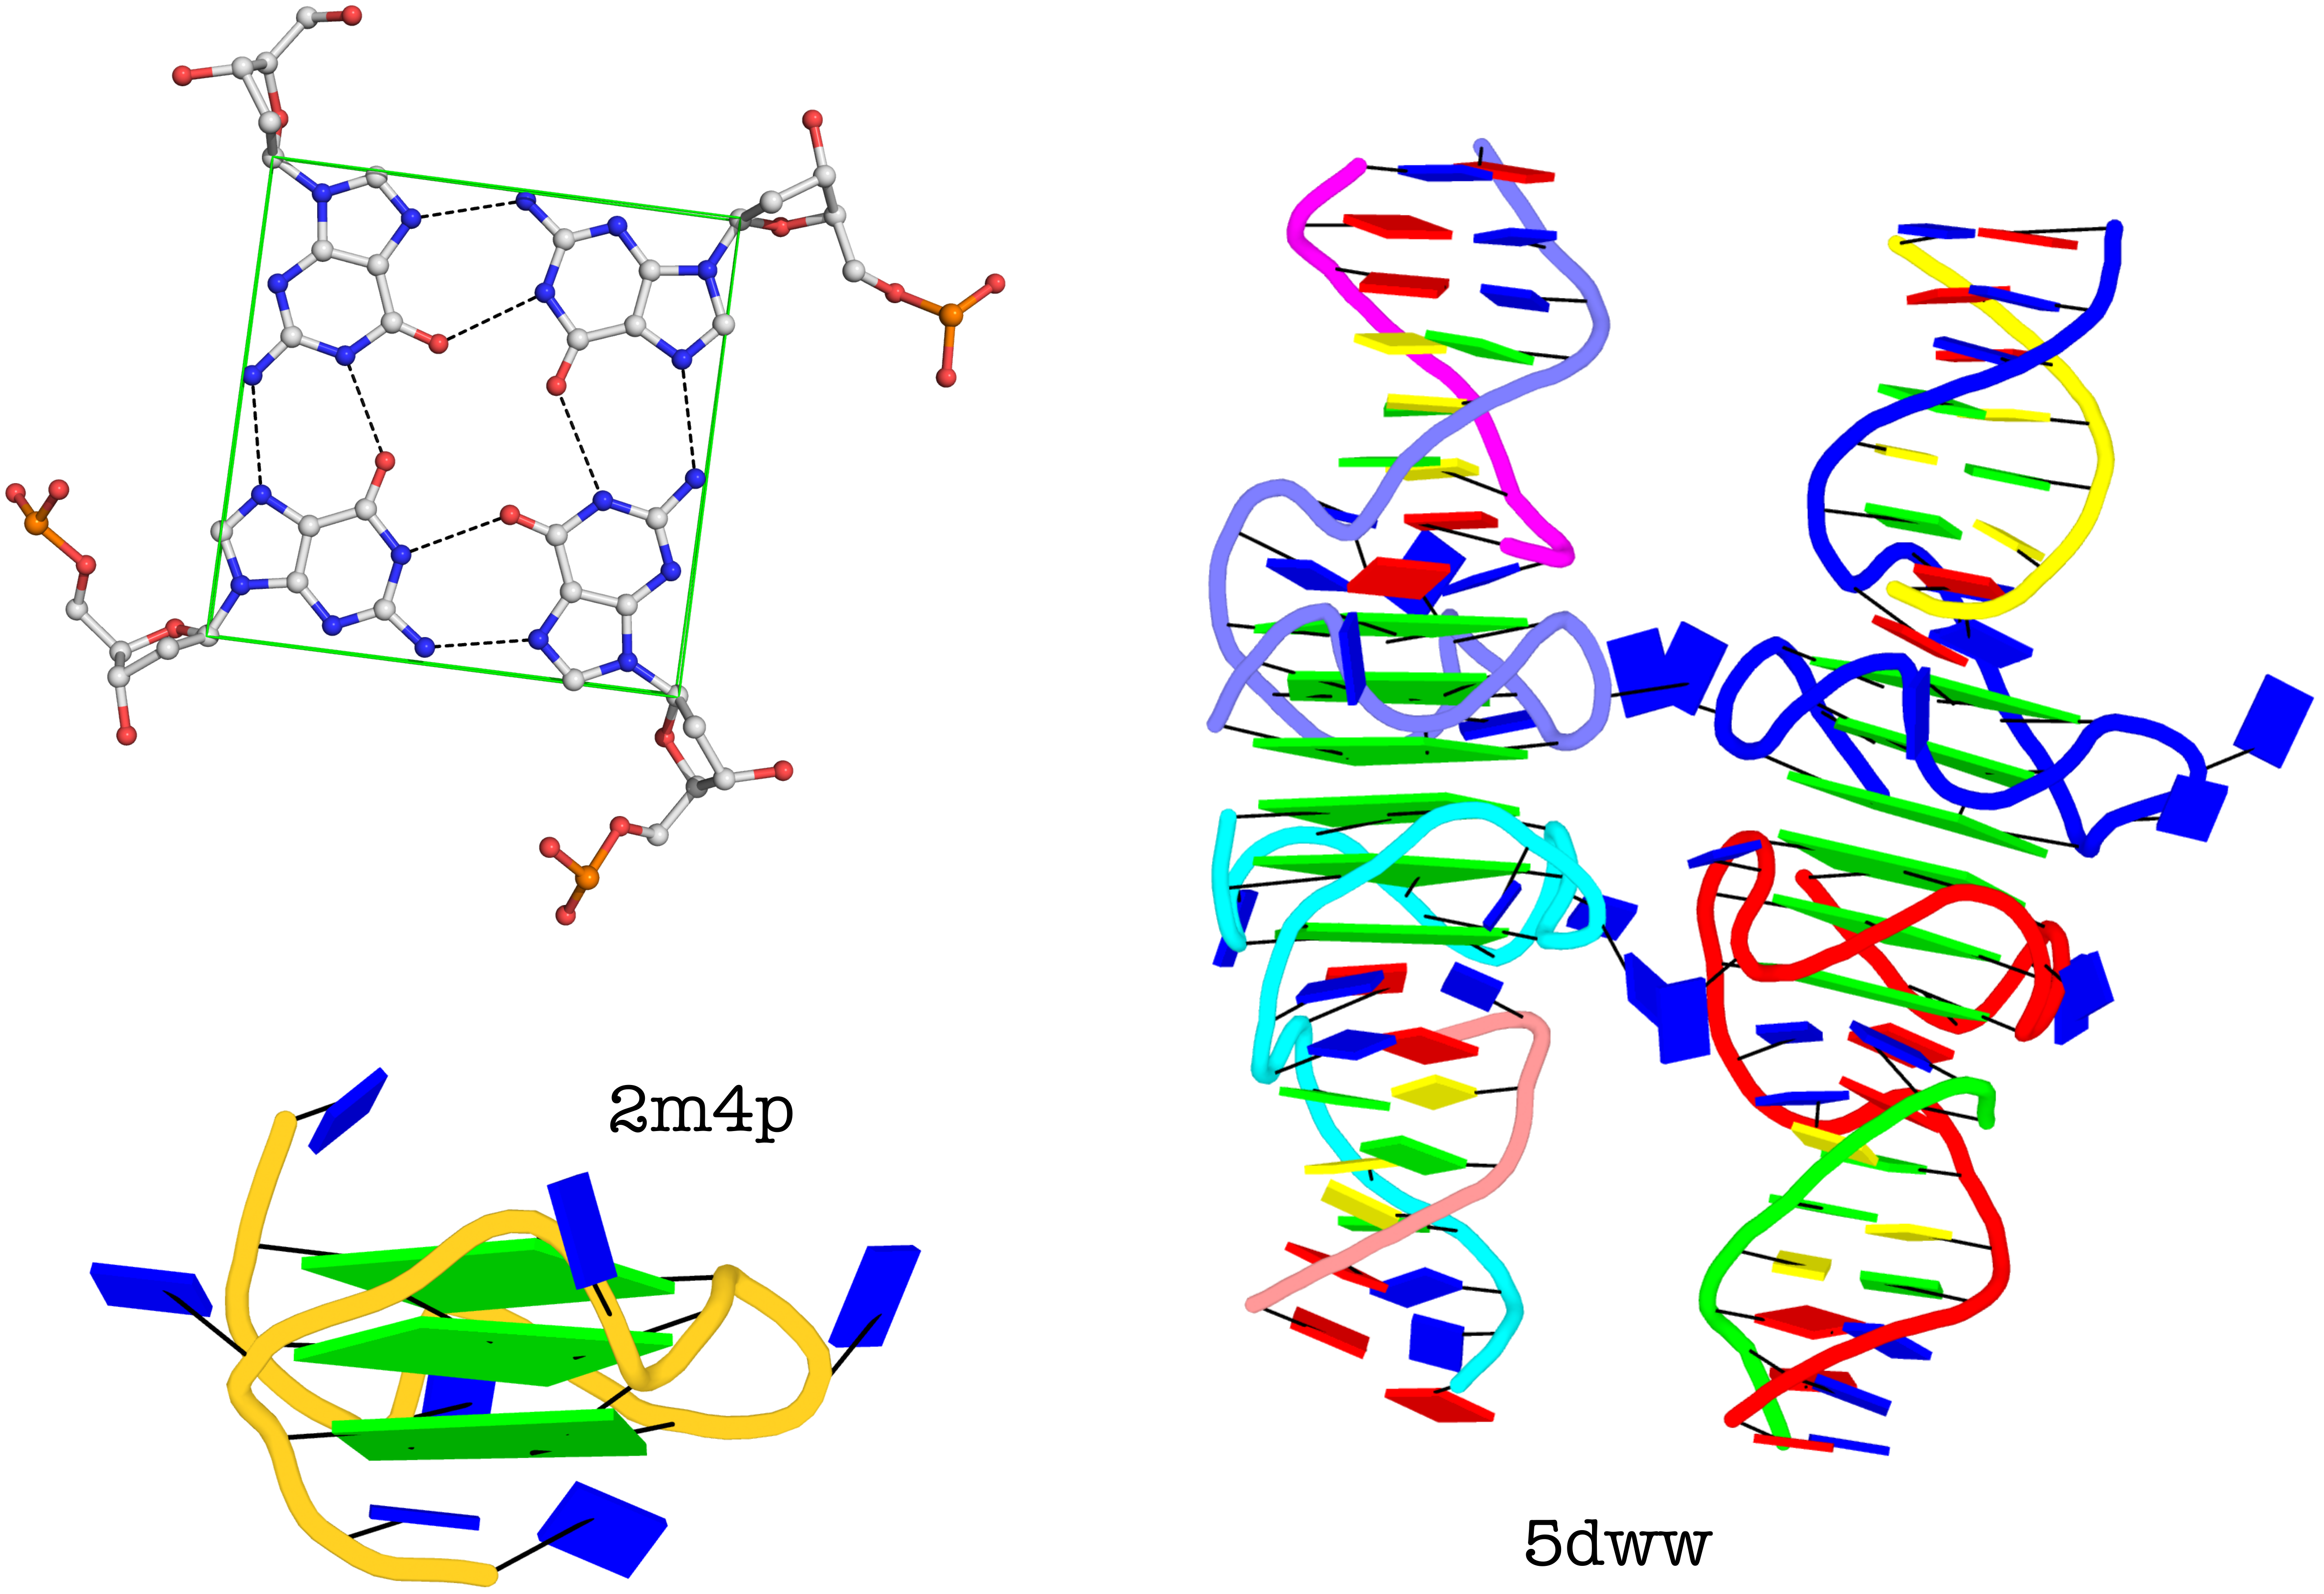 Representative G4 structures